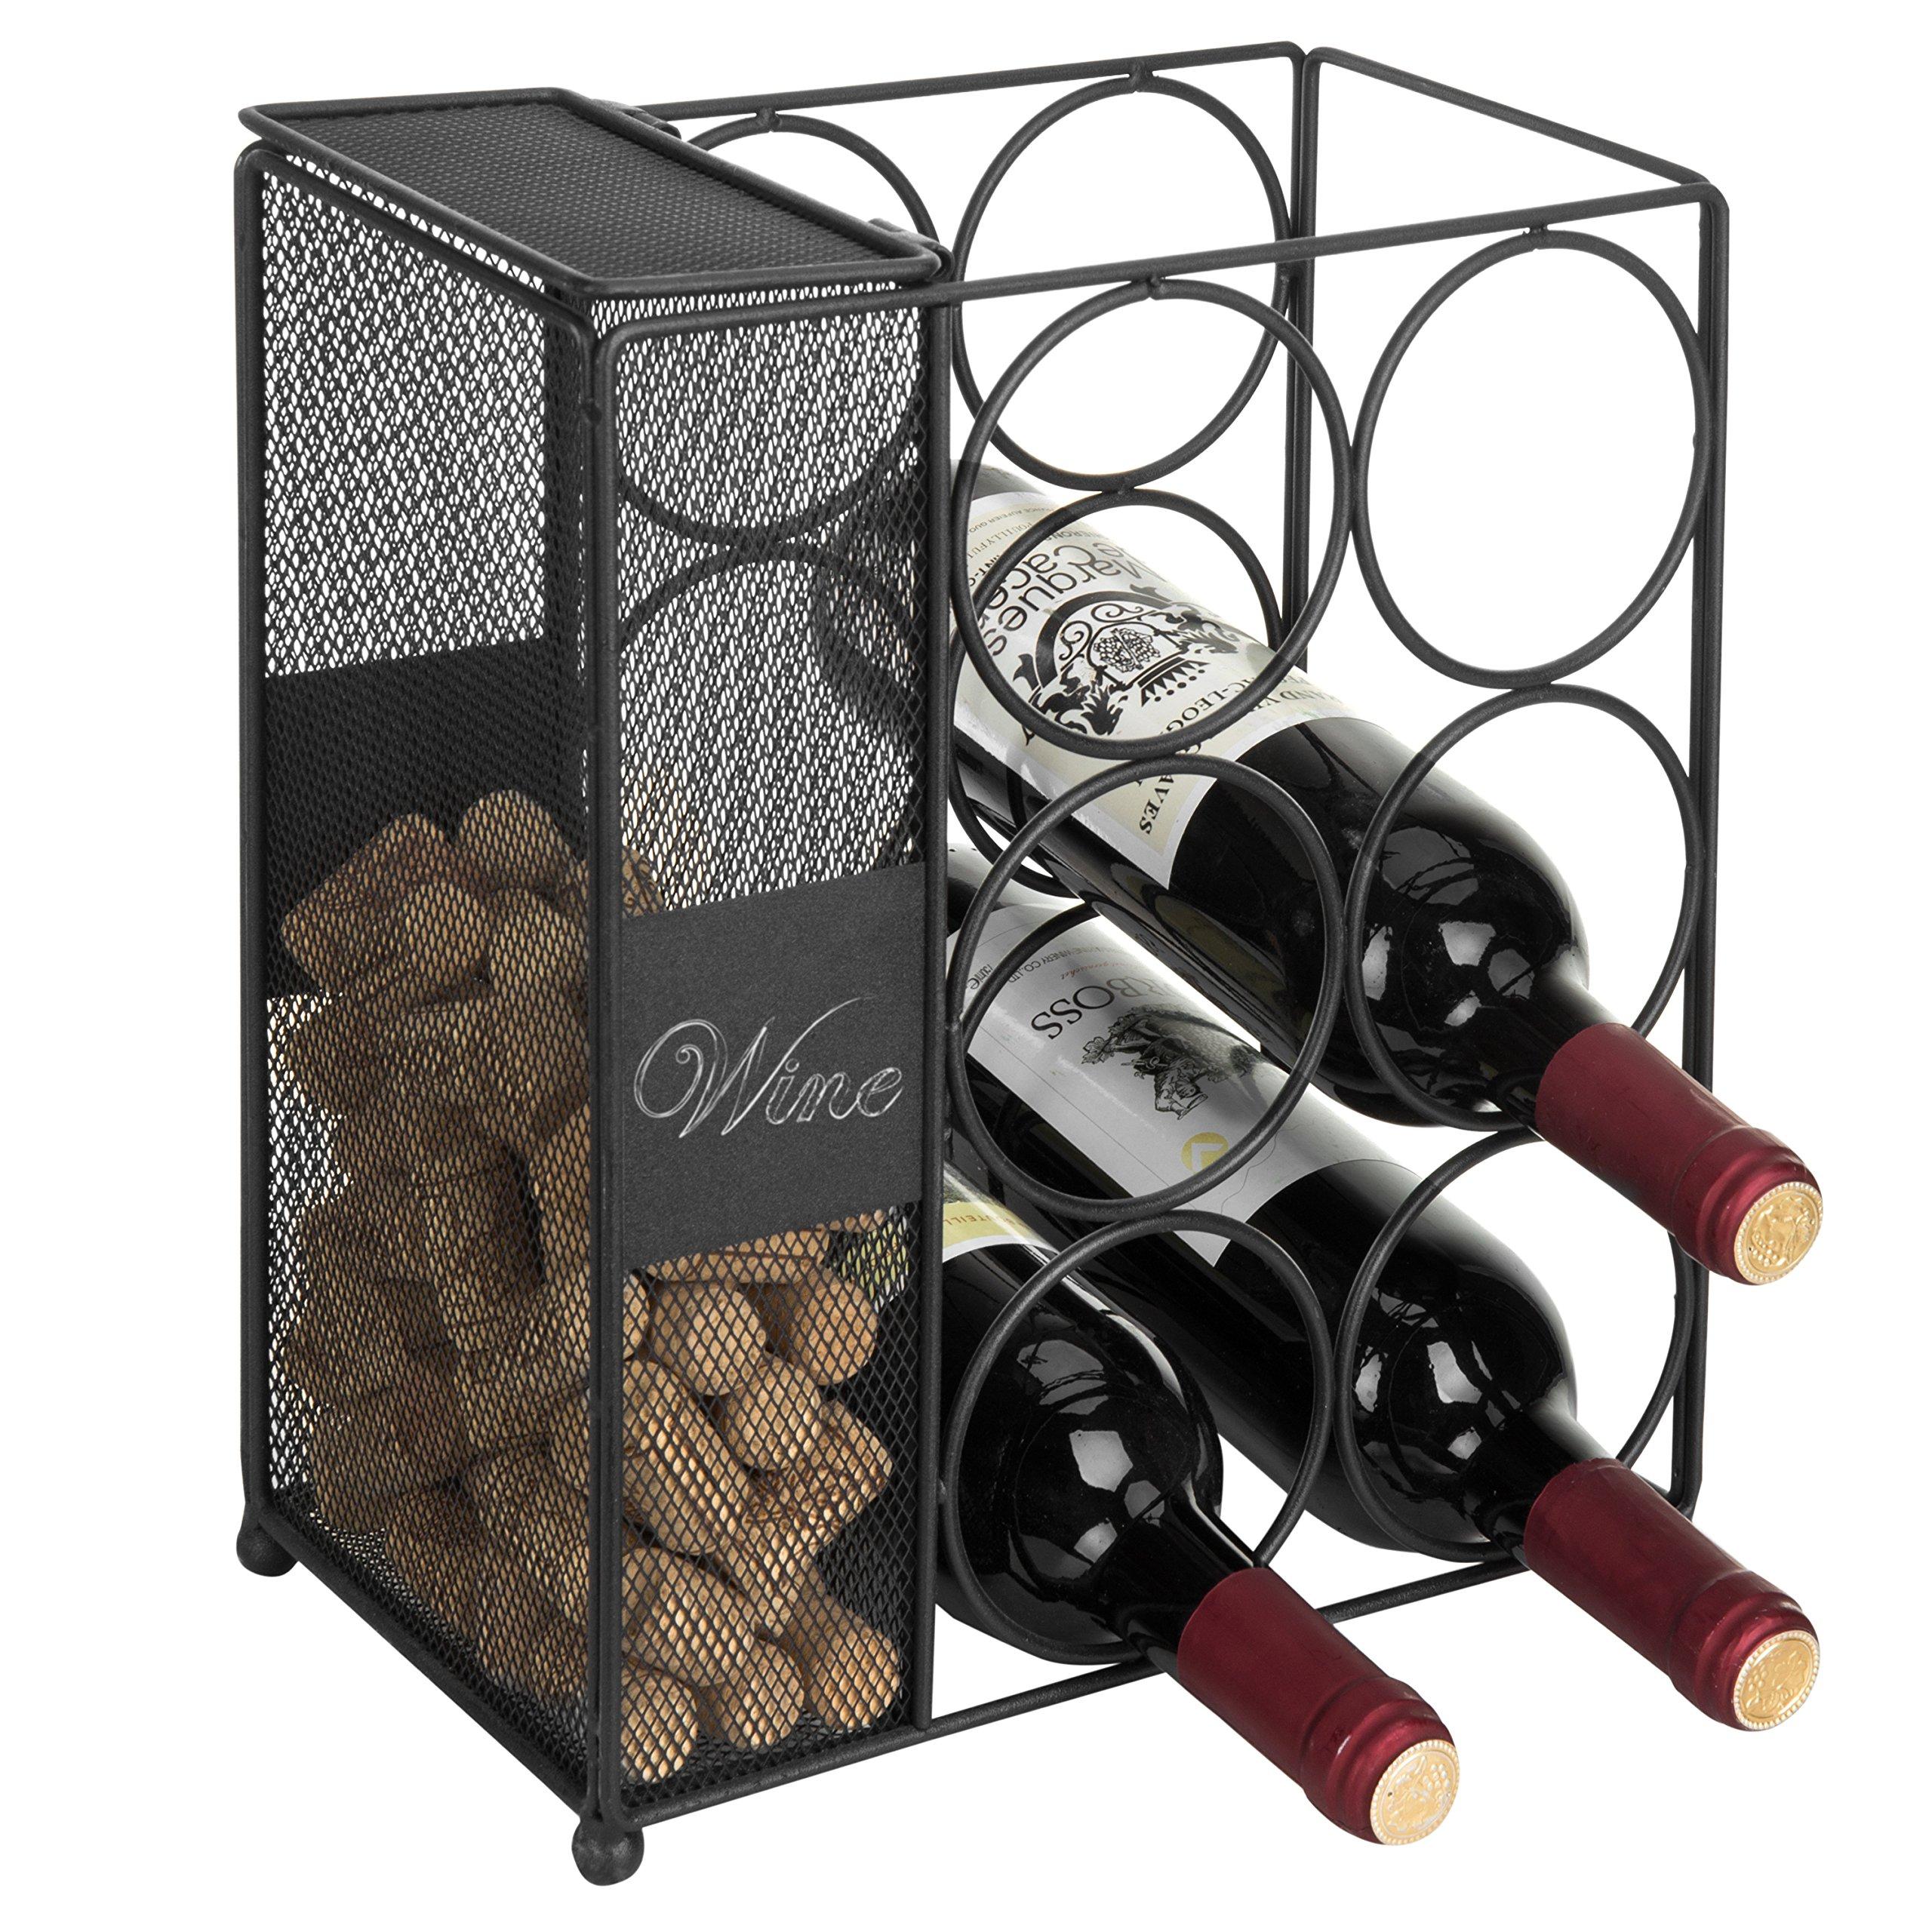 MyGift 6-Bottle Black Wire Wine Rack with Mesh Cork Basket & Chalkboard Labels by MyGift